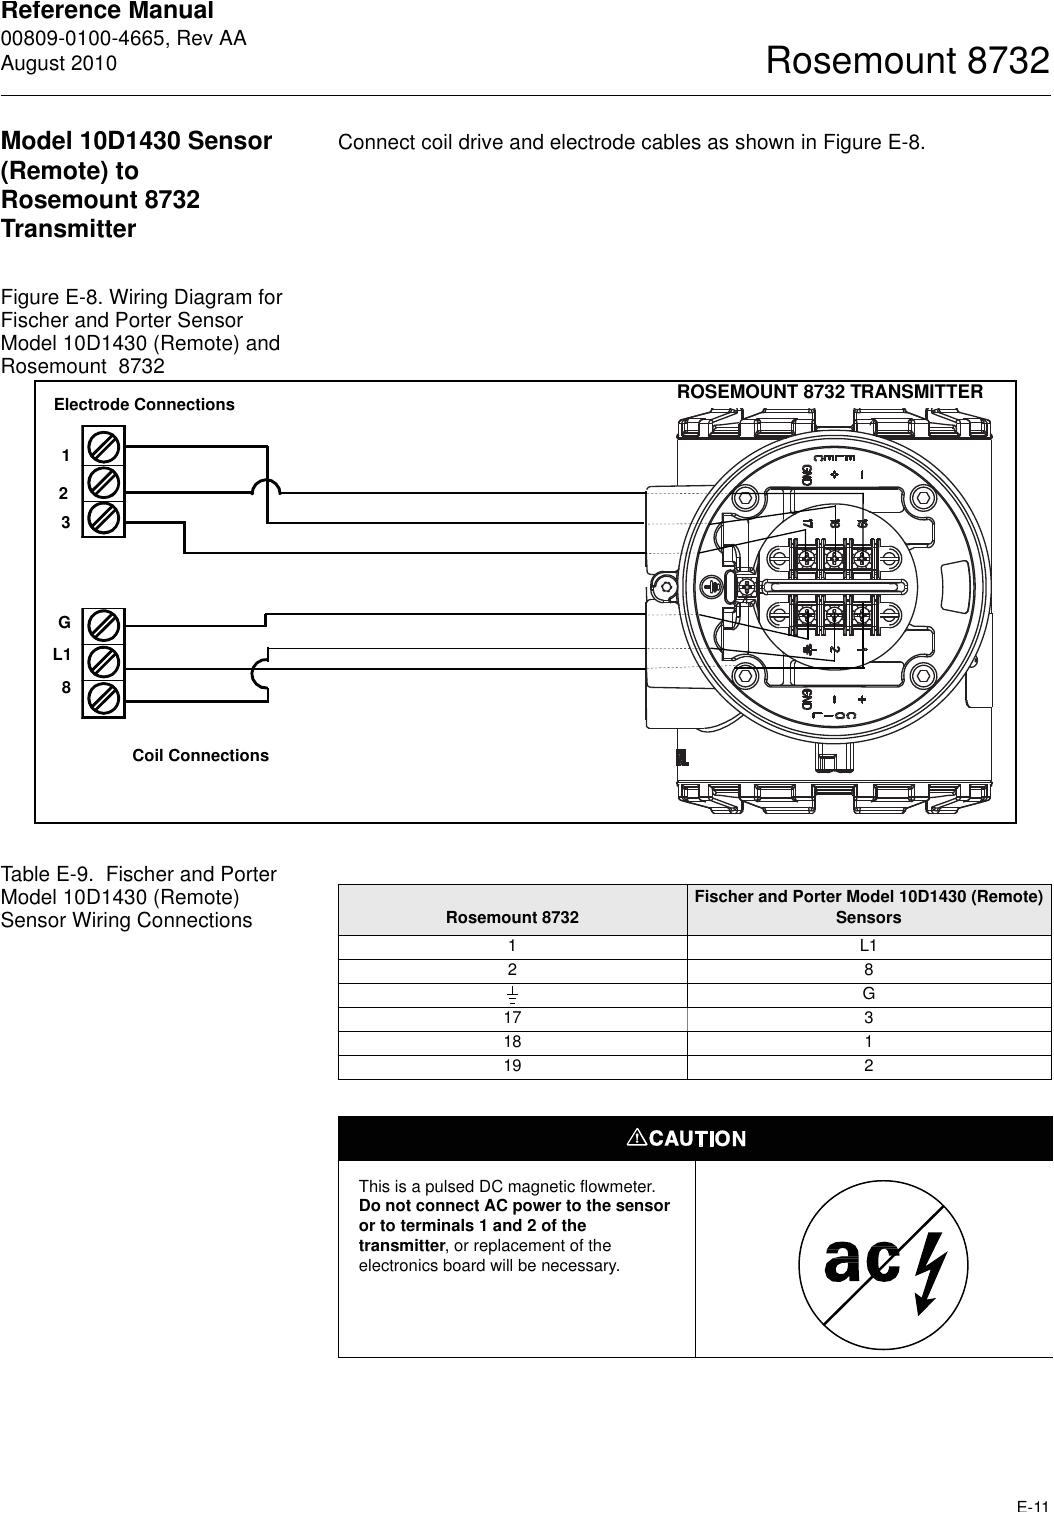 emersonrosemount8732usersmanual165675 30137492 user guide page 137 png